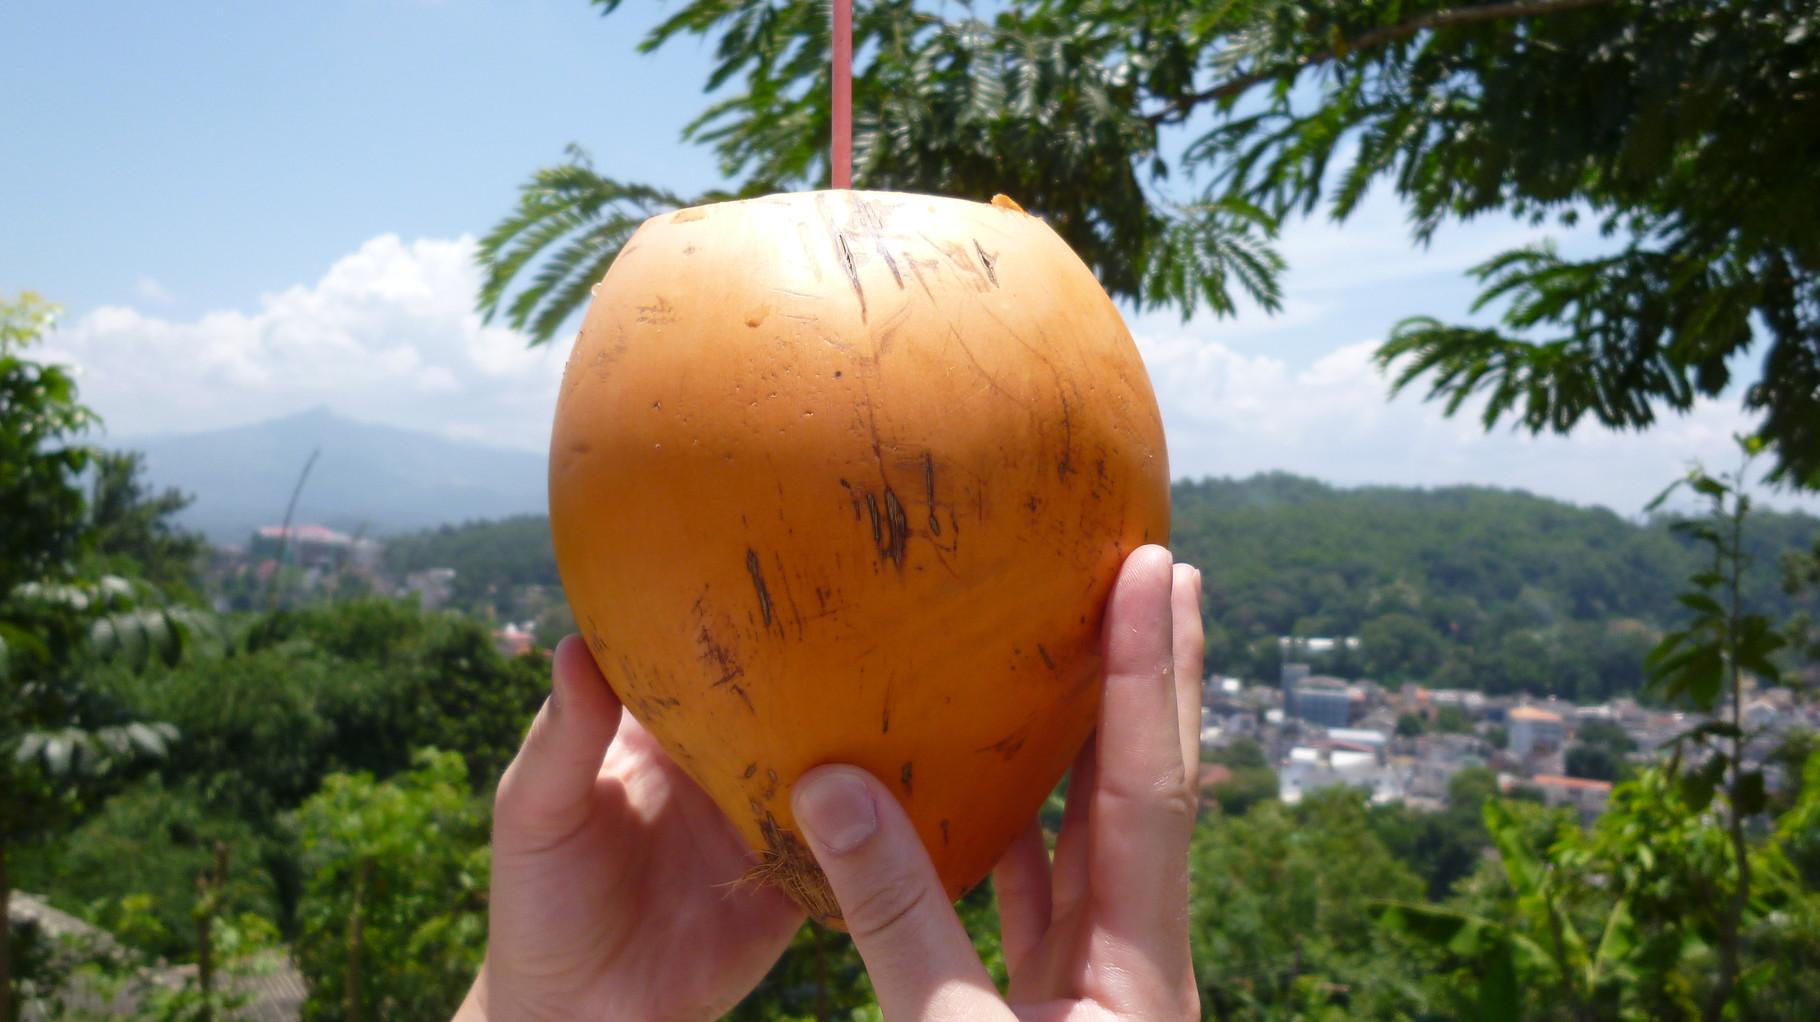 King Coconut - DAS Getränk in Sri Lanka